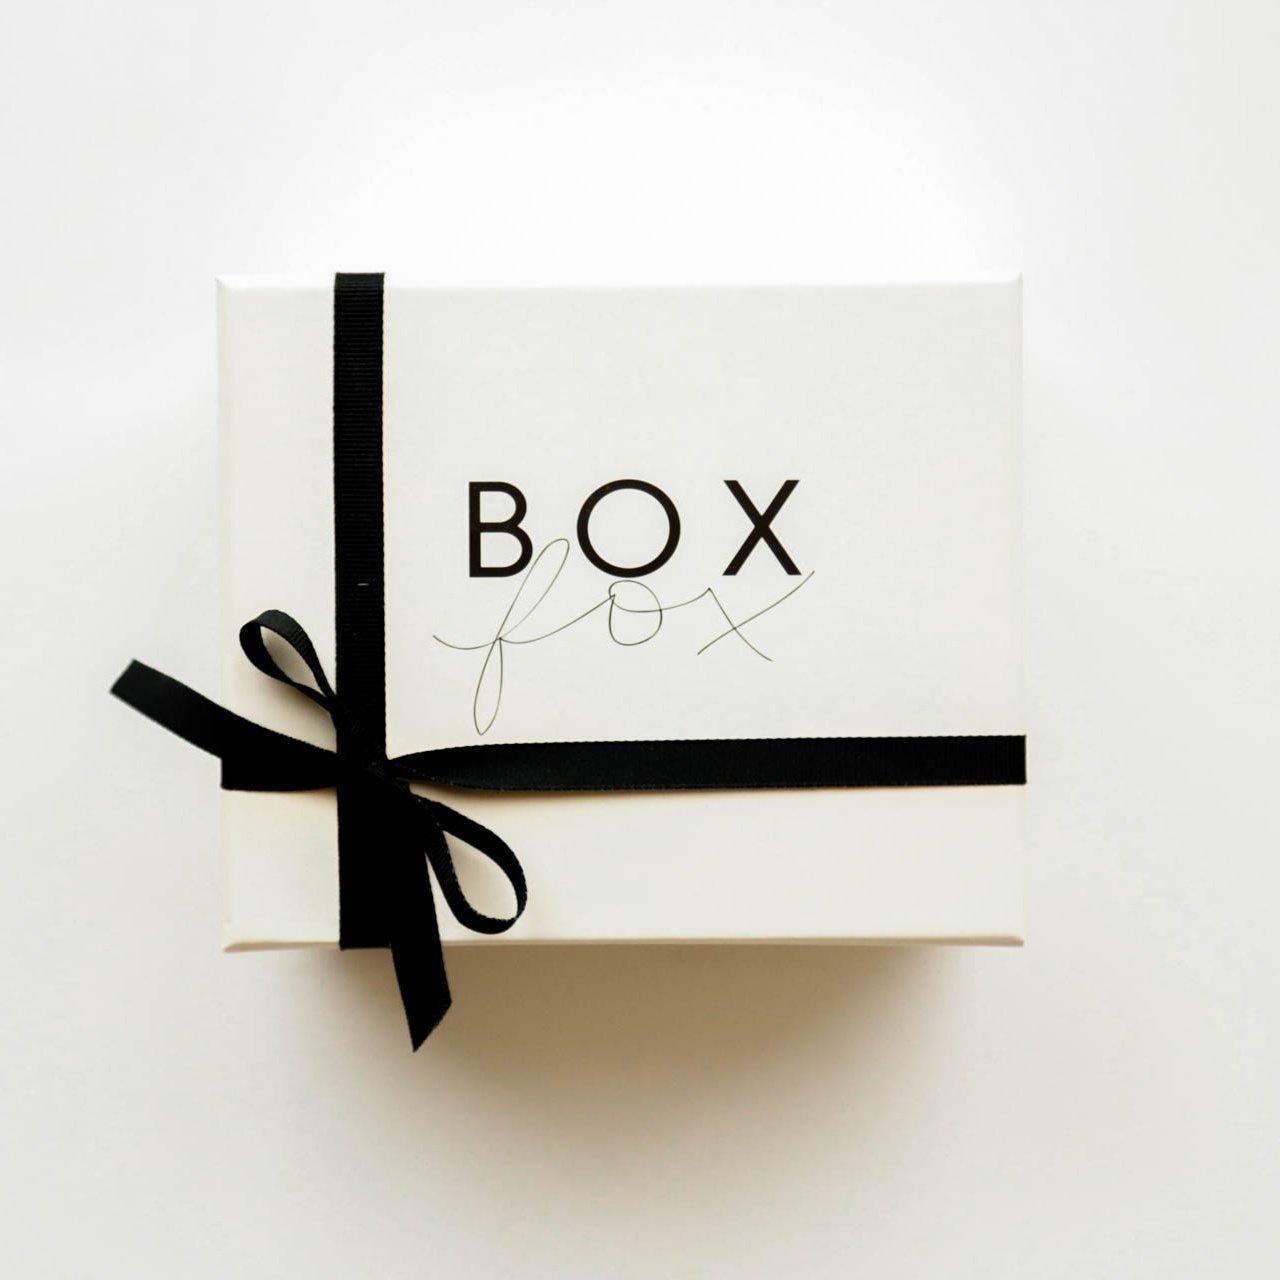 BoxFox.jpg